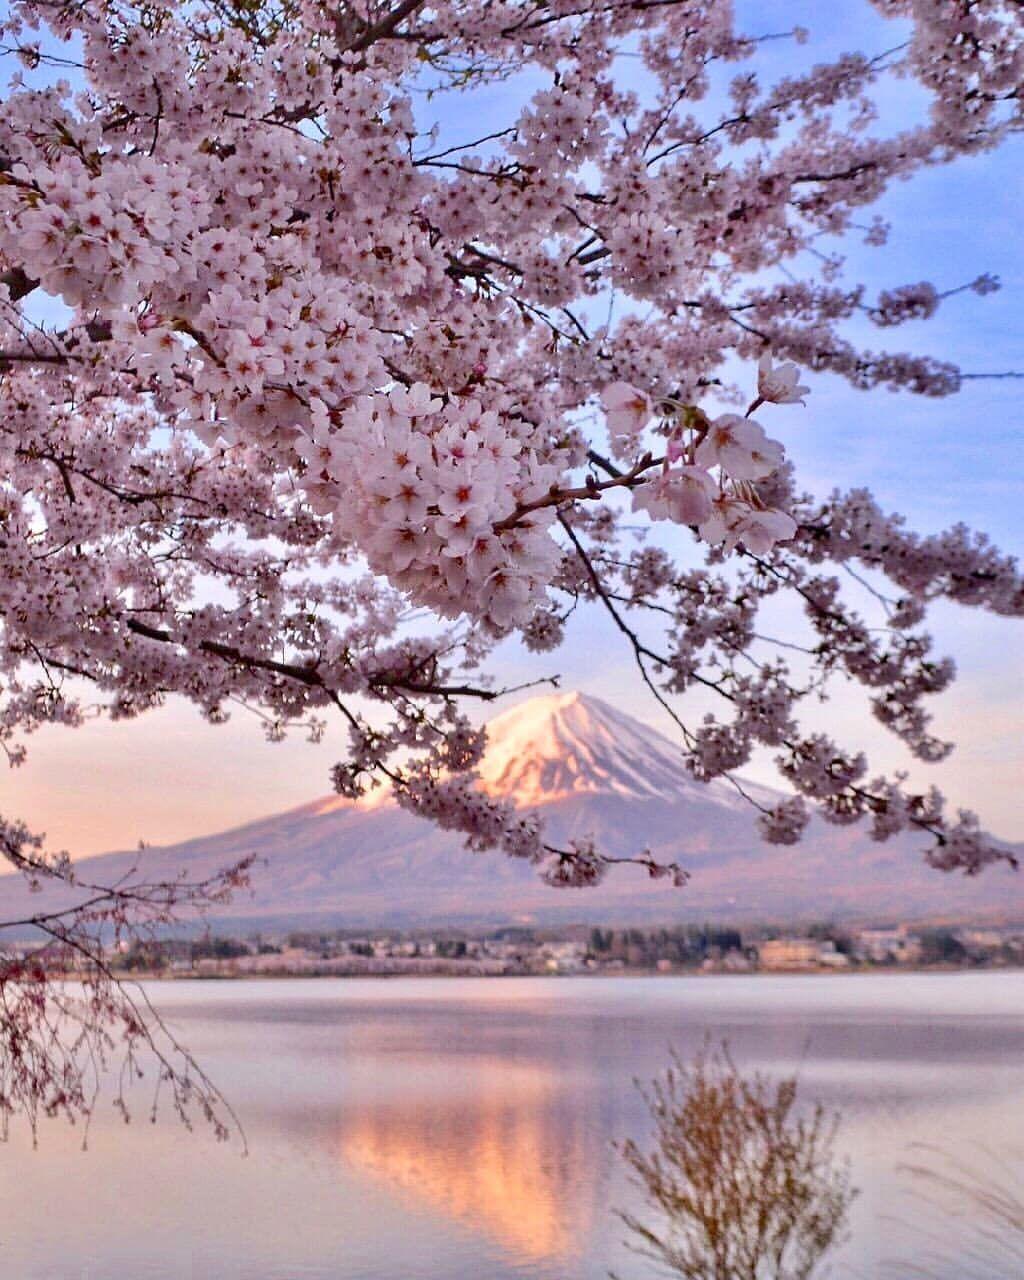 Pin By Rasya Safira On Pink Flowers Aesthetic Cherry Blossom Japan Japan Sakura Japan Travel